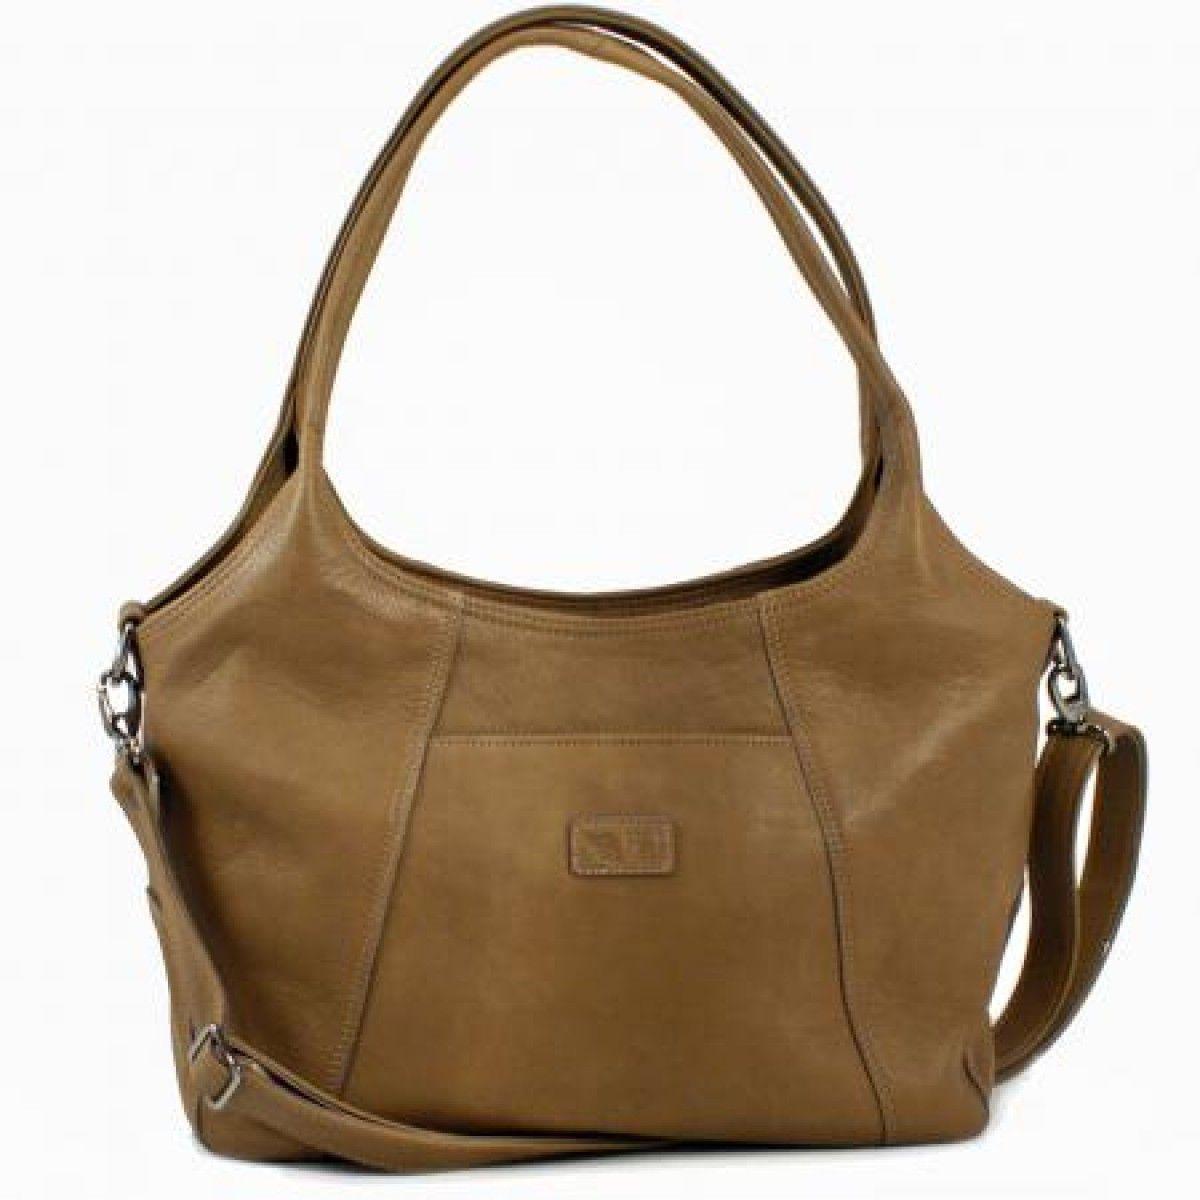 Handtasche Zingara aus Leder / Leather hand bag Zingara